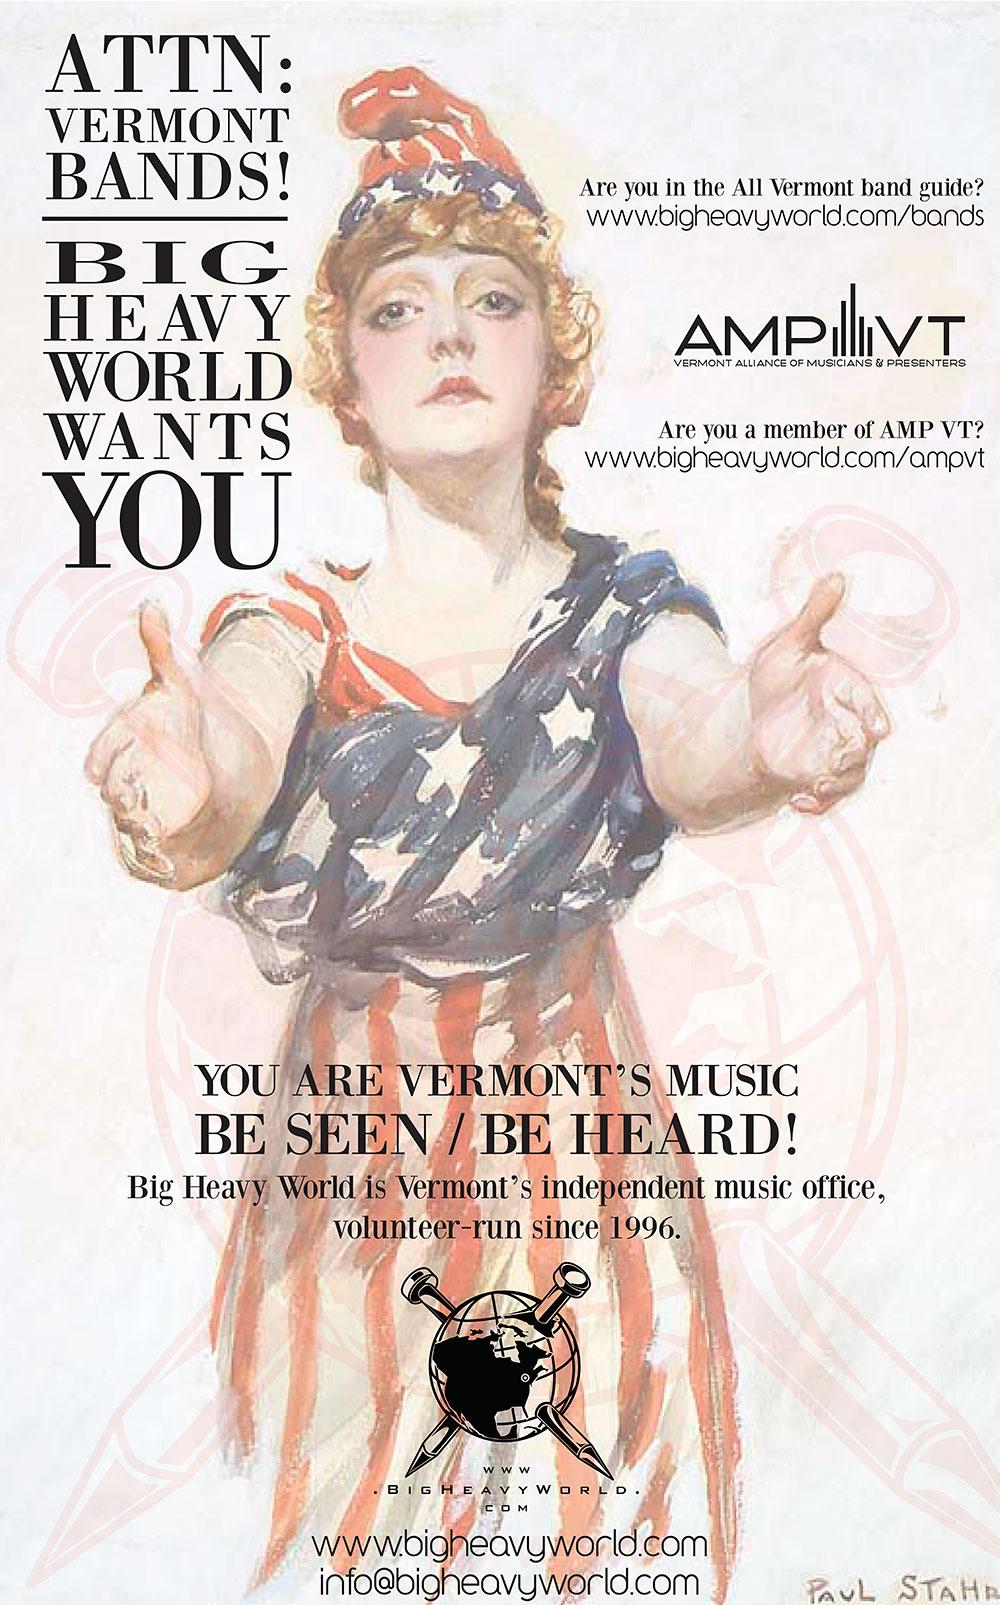 AMP VT